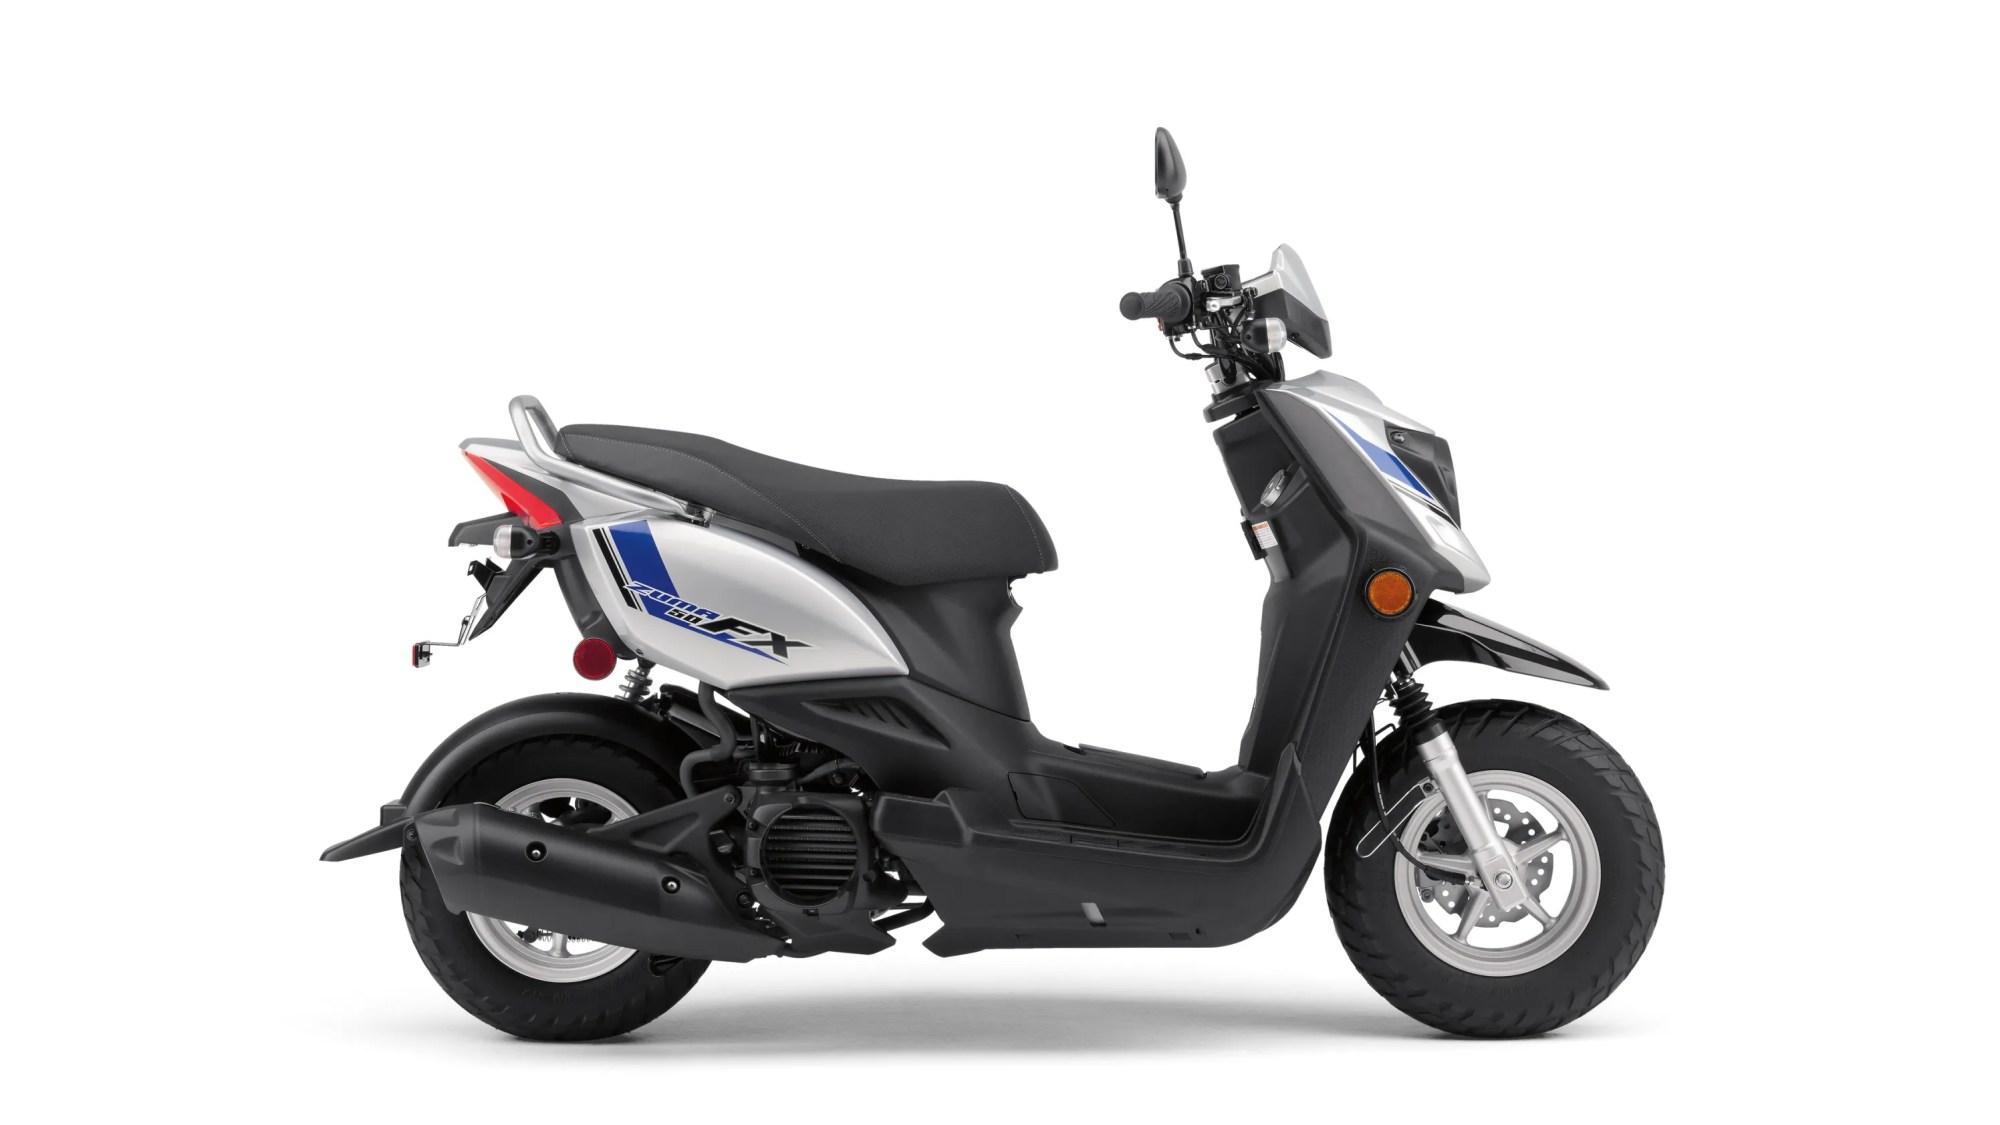 hight resolution of 150cc 4 stroke engine diagram for honda metropolitan moped